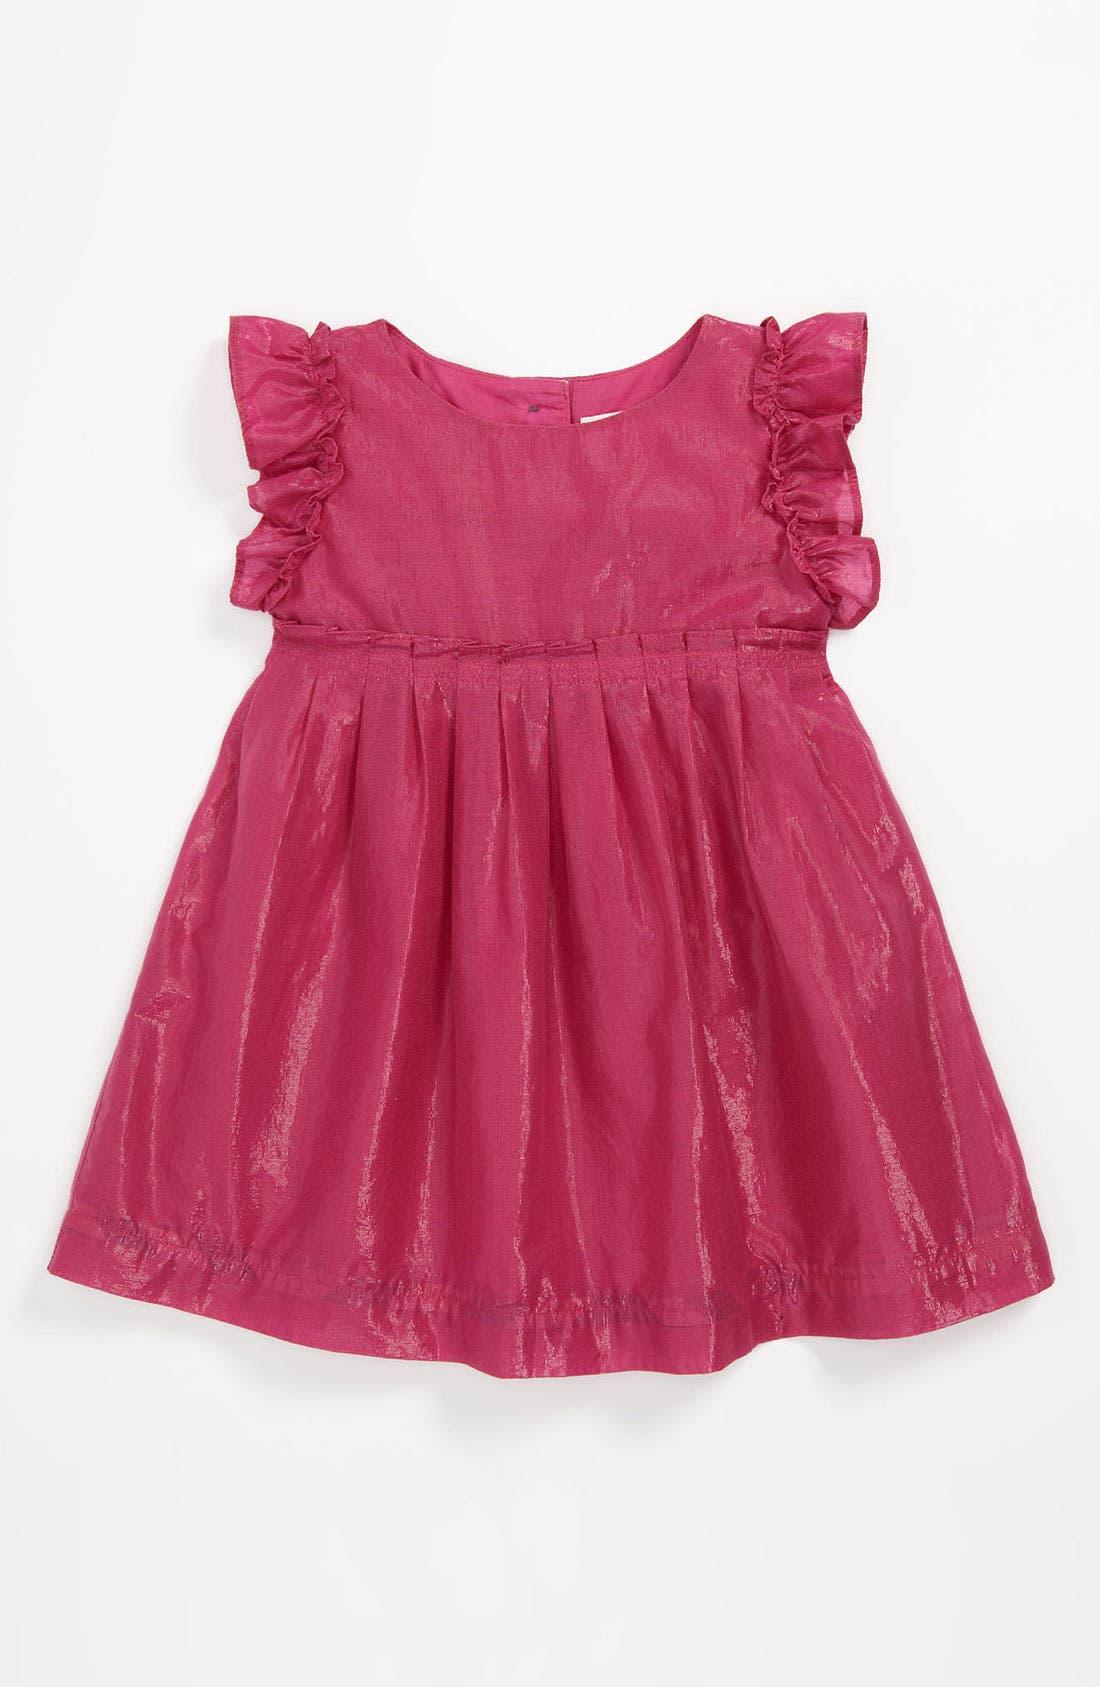 Alternate Image 1 Selected - Burberry 'Nadia' Dress (Baby)